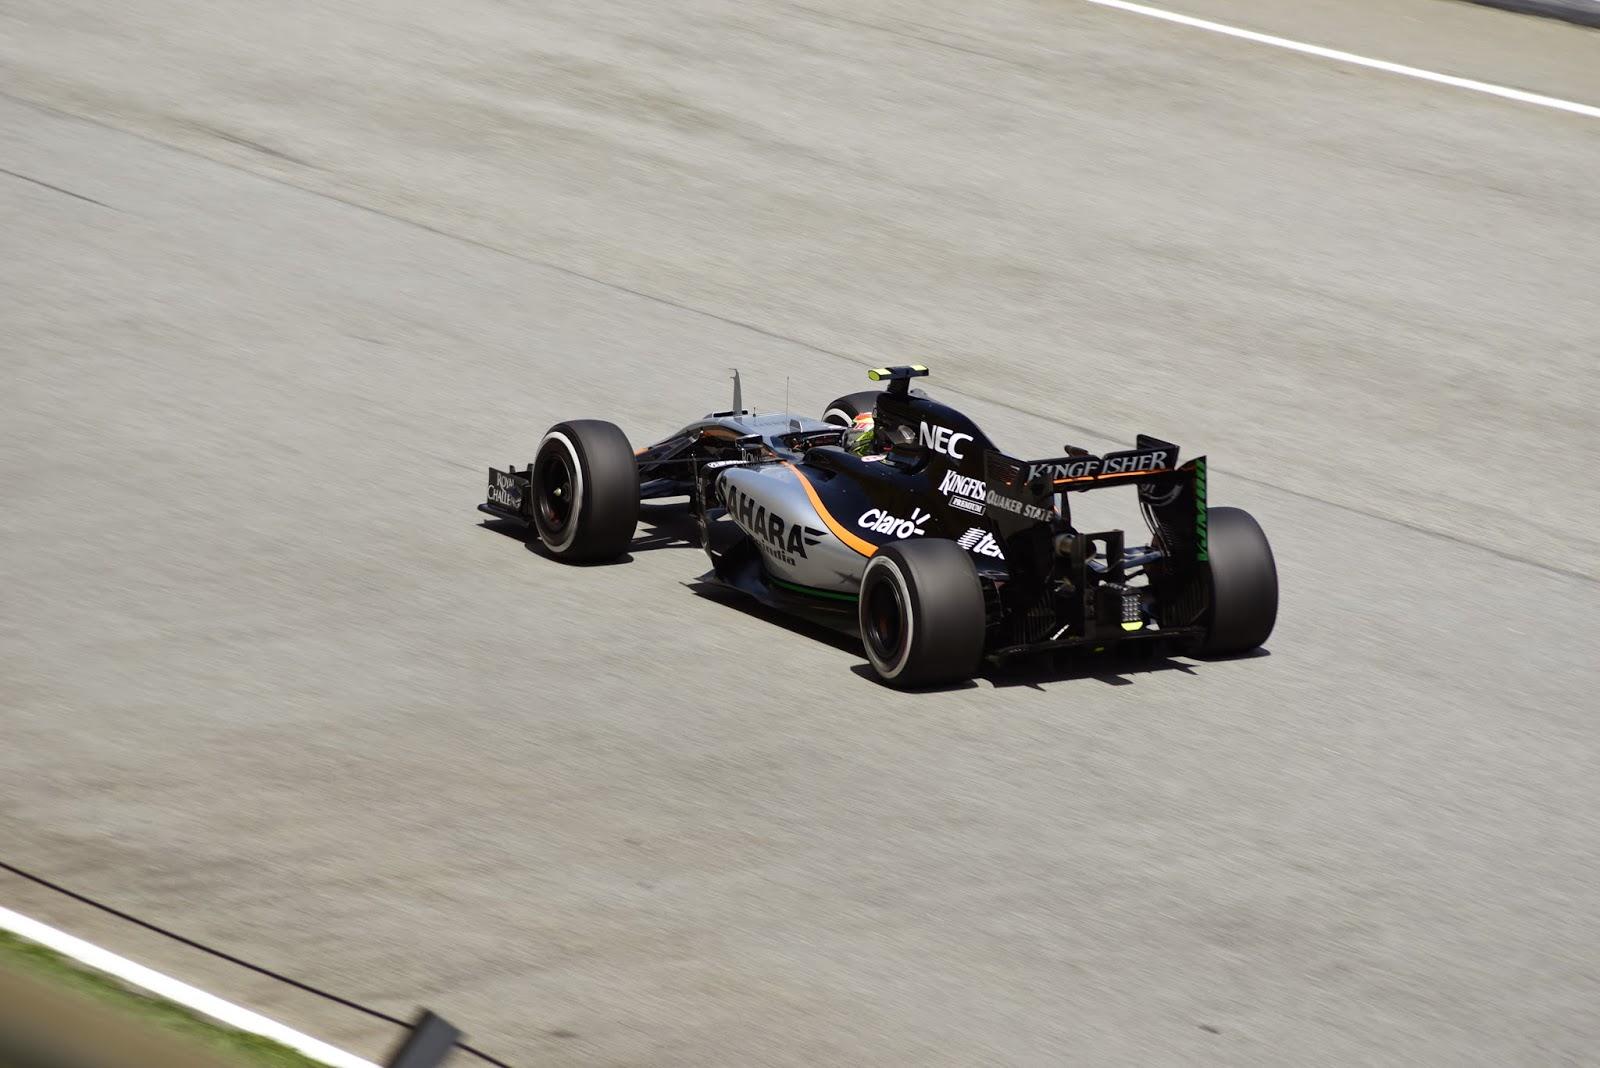 Force India Formula 1 Car